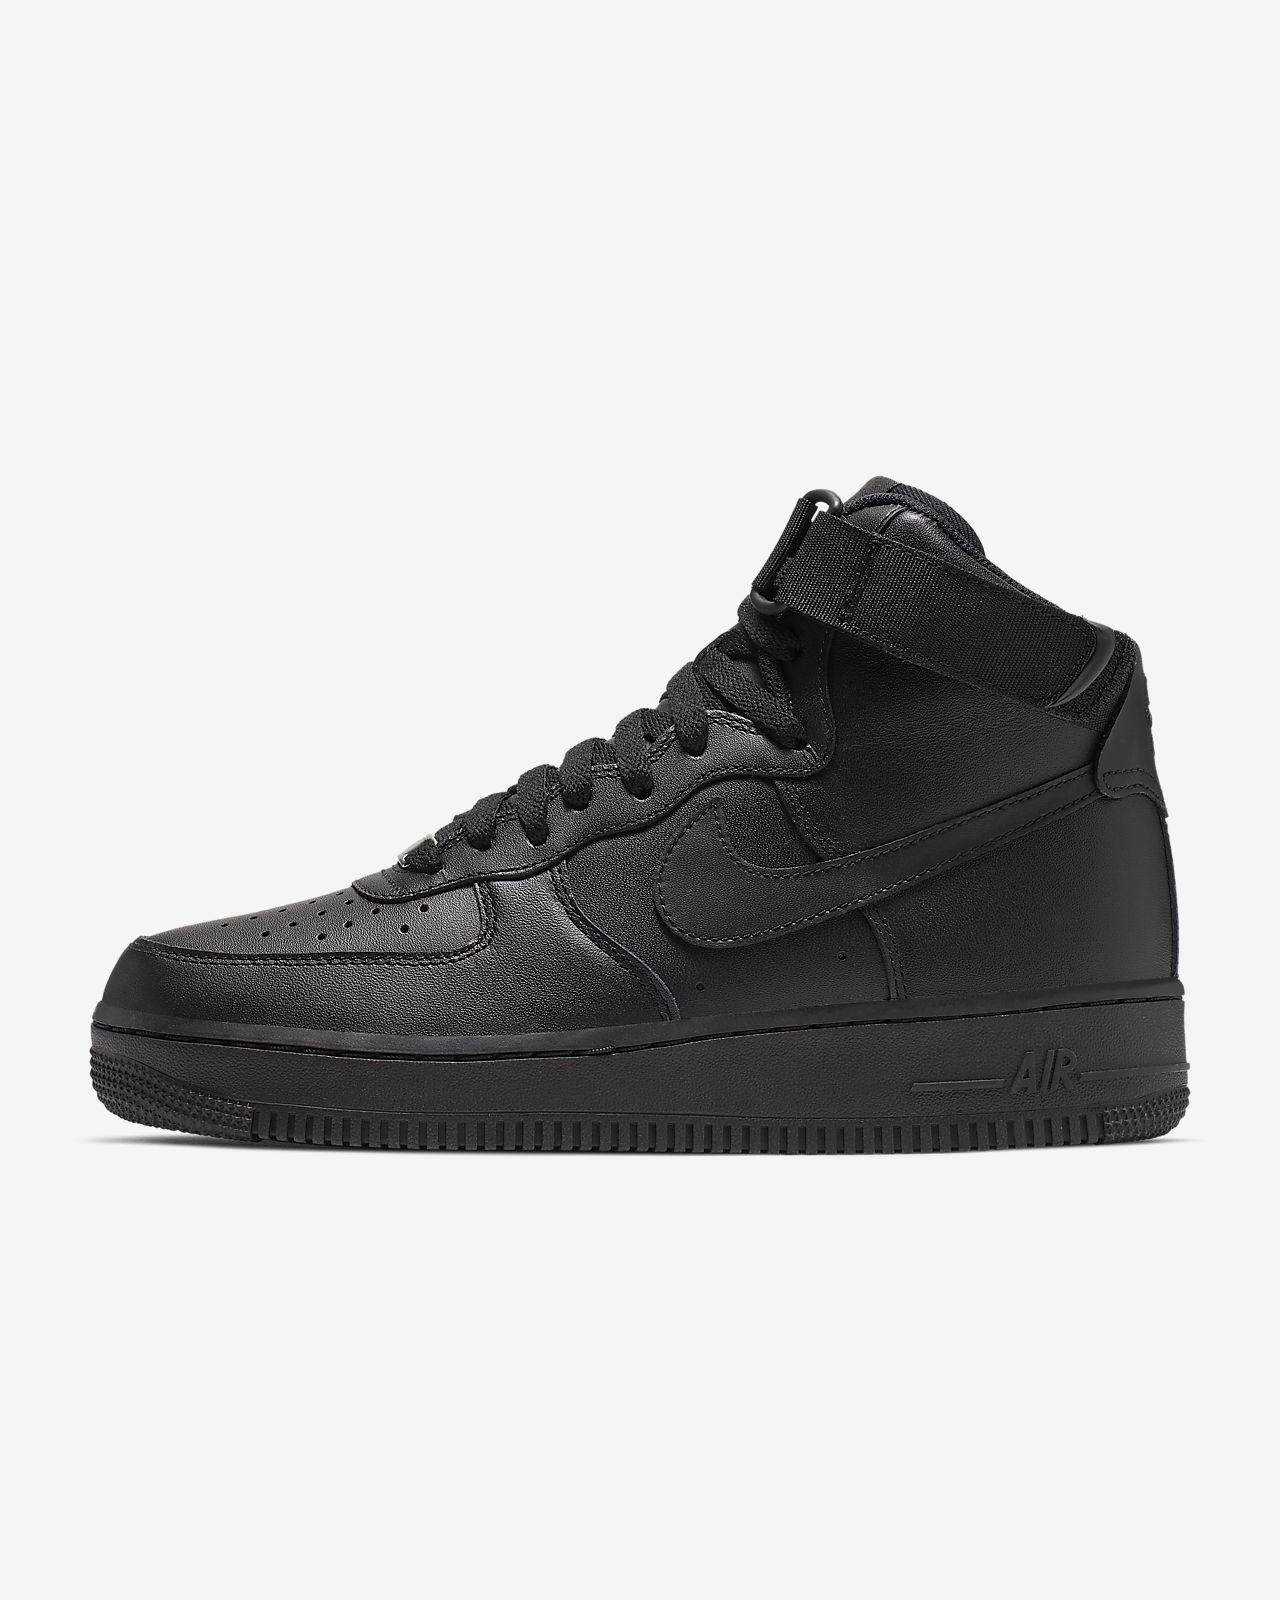 watch e3d94 09d5e Nike Air Force 1 High 08 LE Women's Shoe